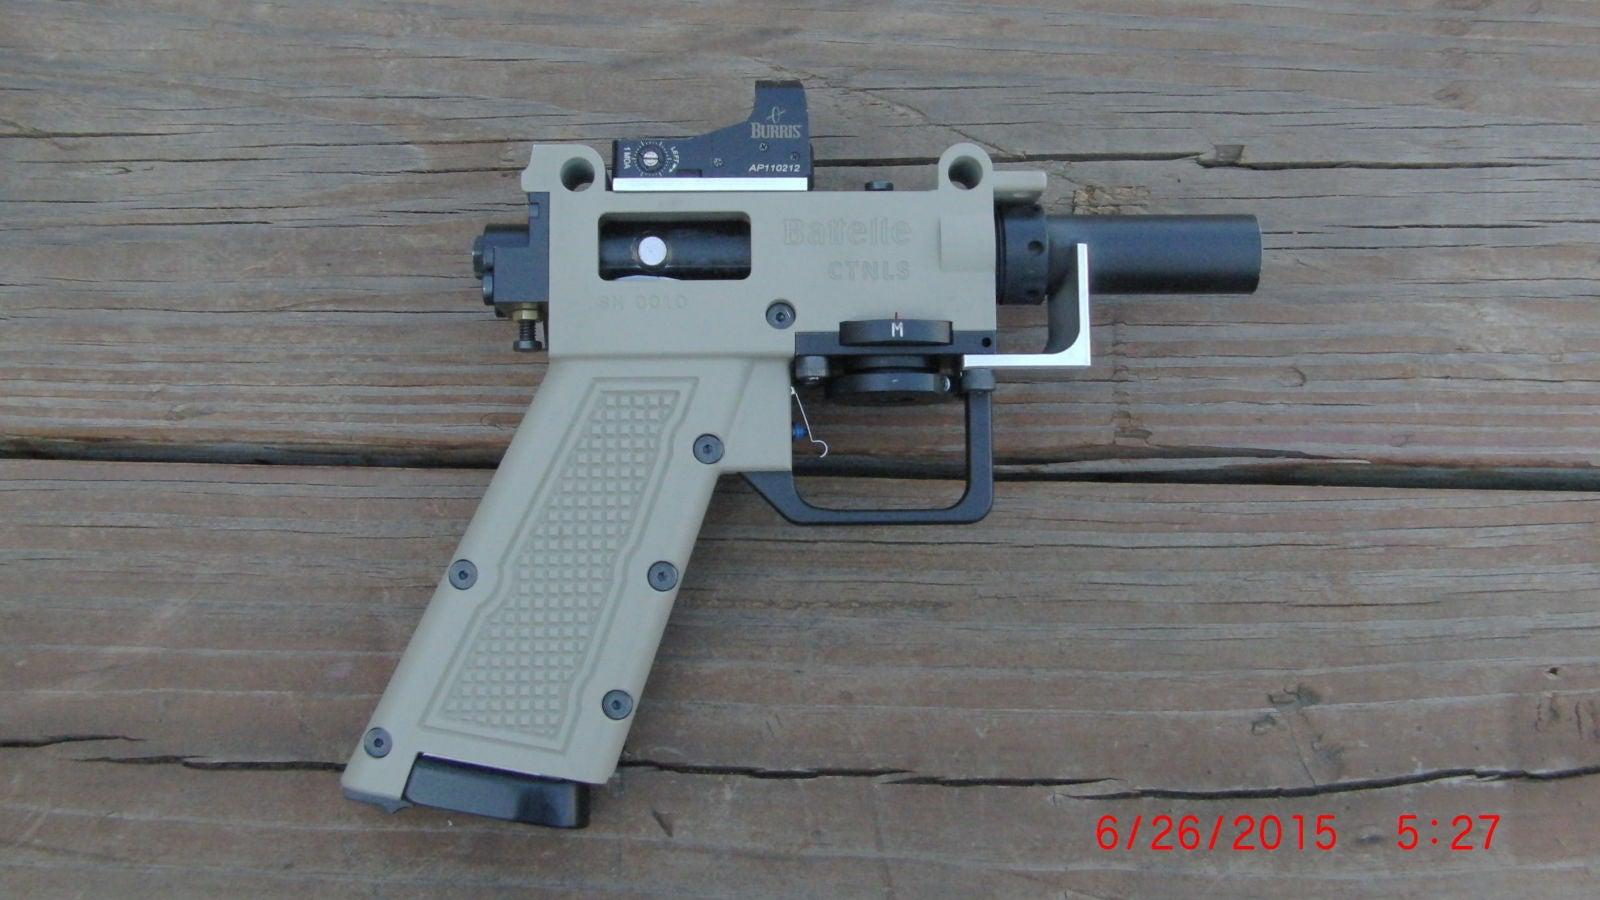 A Variable-Velocity Gun Can Shoot Just Slow Enough to (Hopefully) Not Kill People